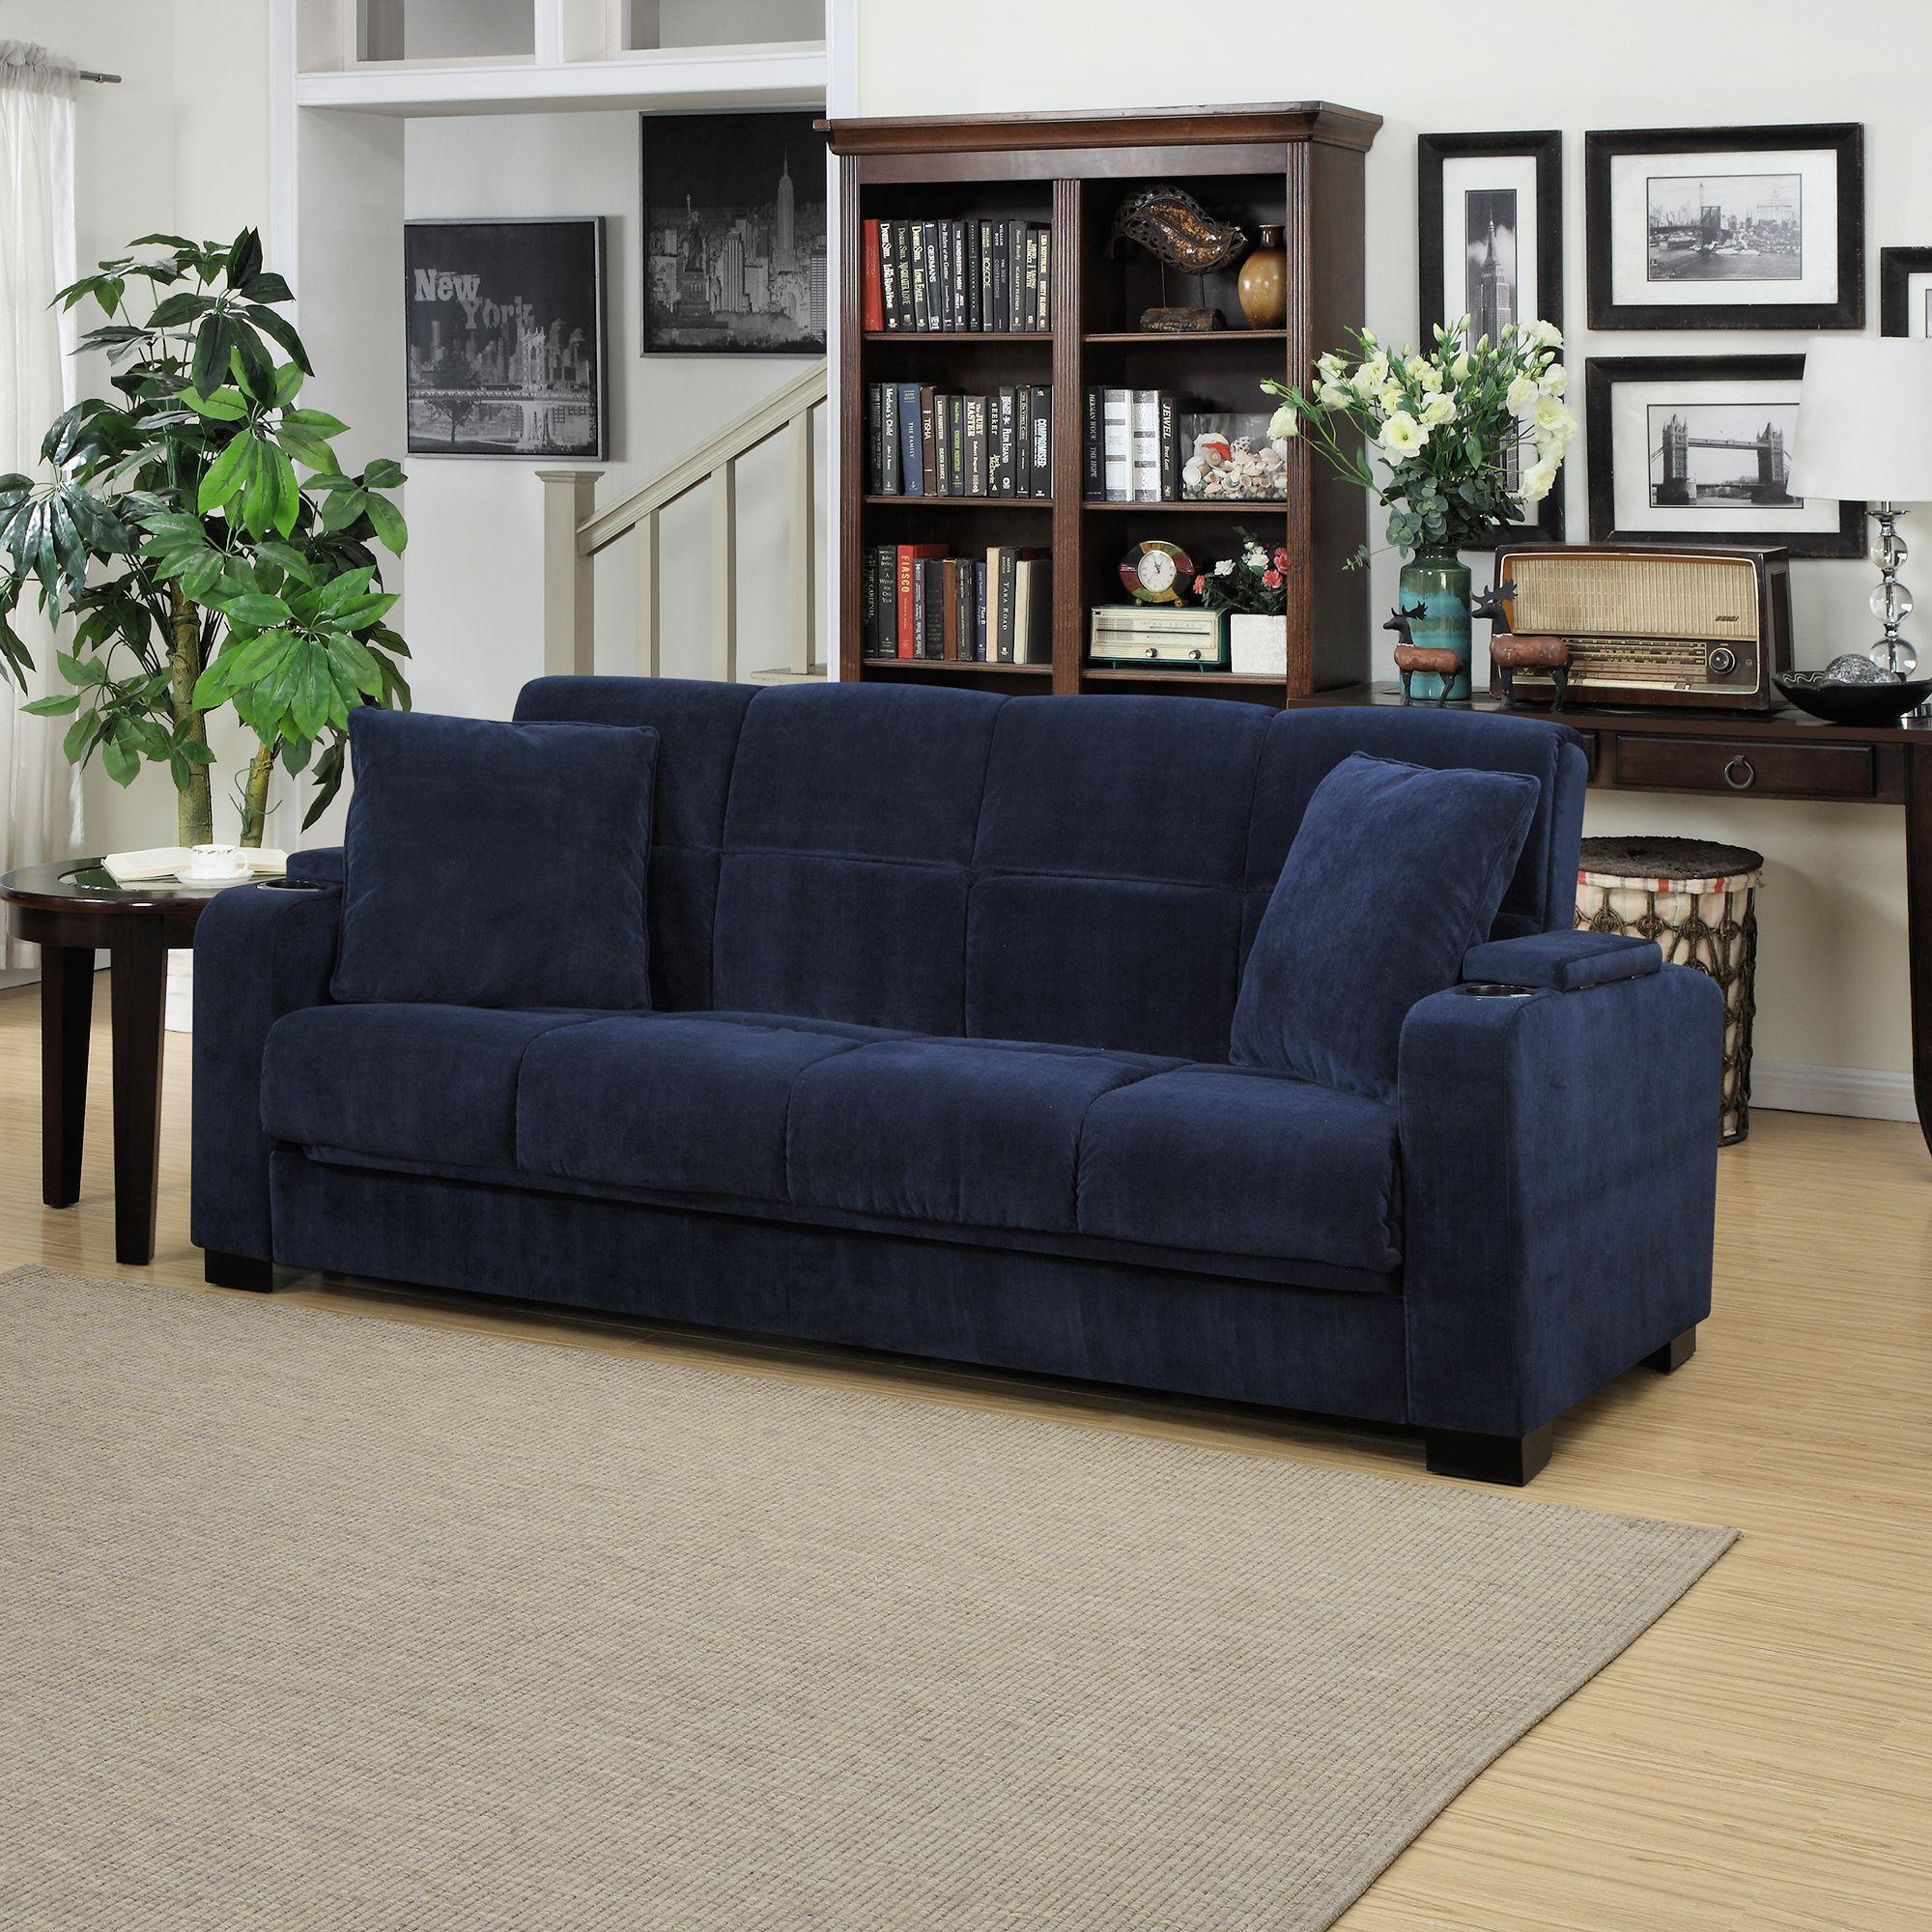 Blue Velvet In A Sleeper Sofa Yes Please Consider Adding The